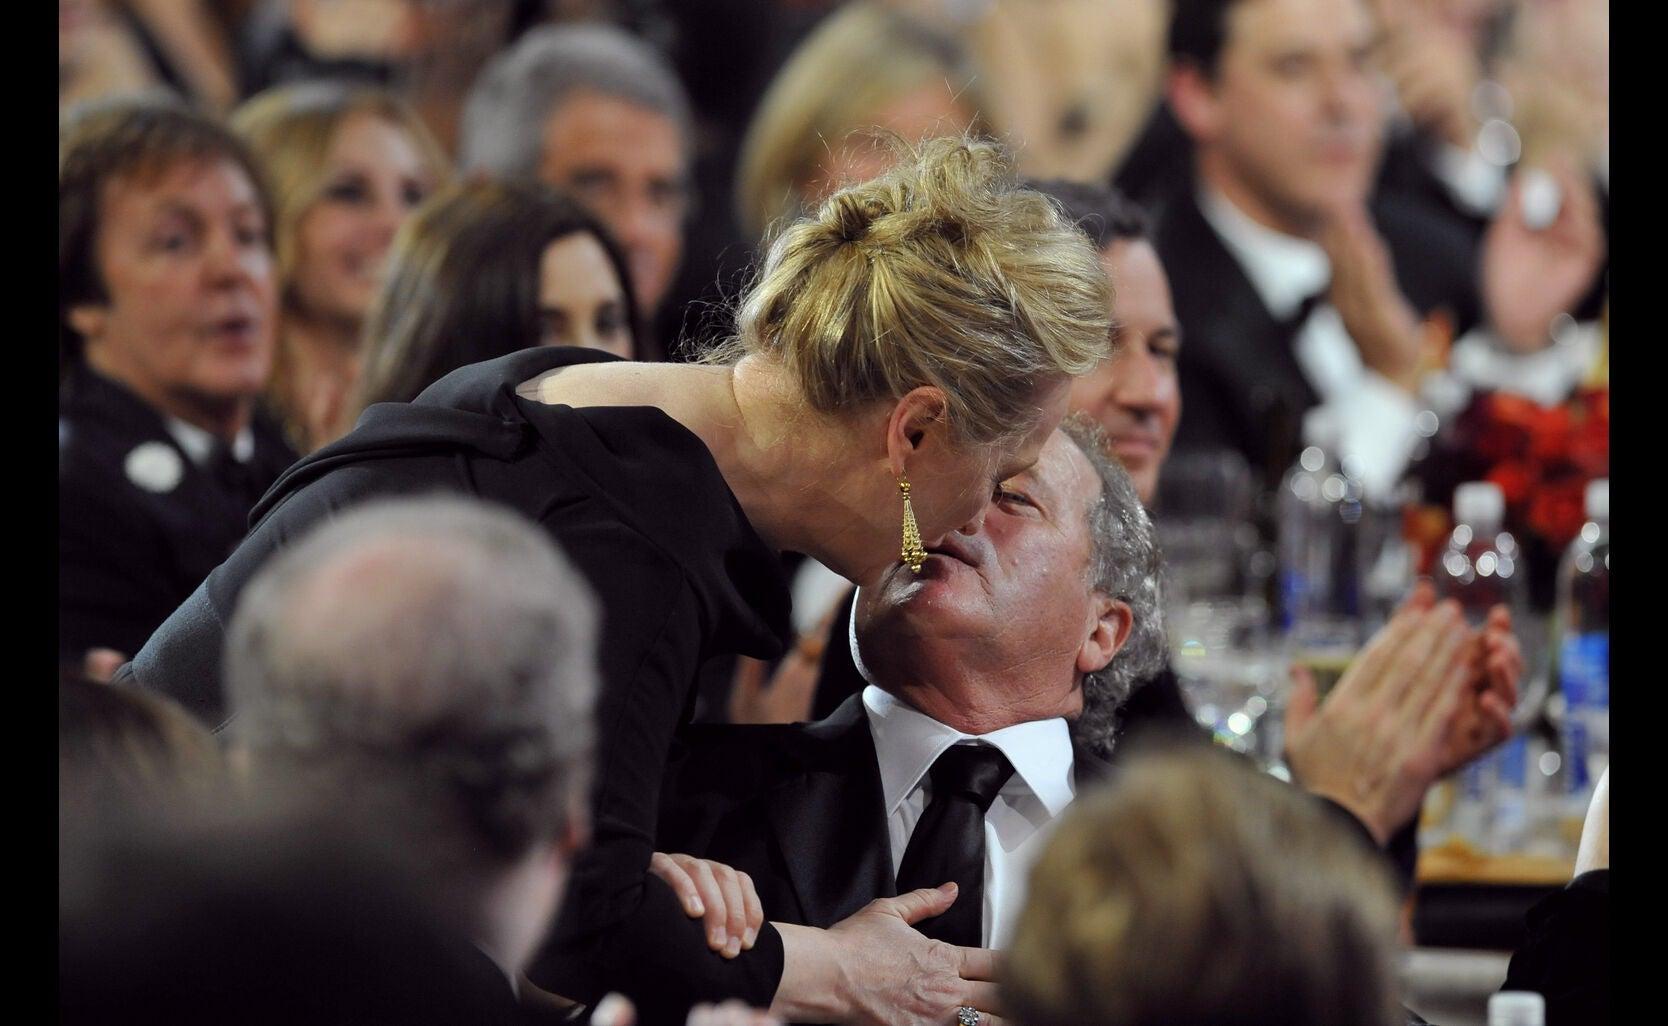 Actress Meryl Streep, Golden Globe winner, and husband Don Gummer